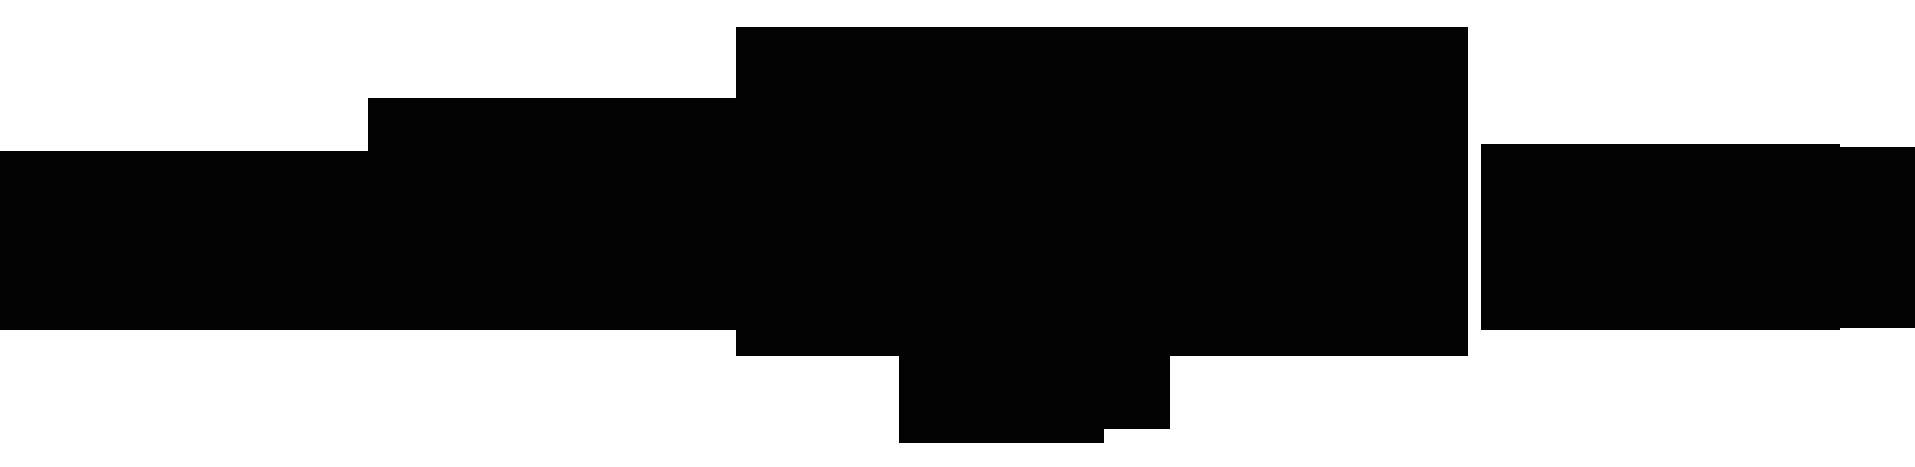 UCSD Black Logo.png